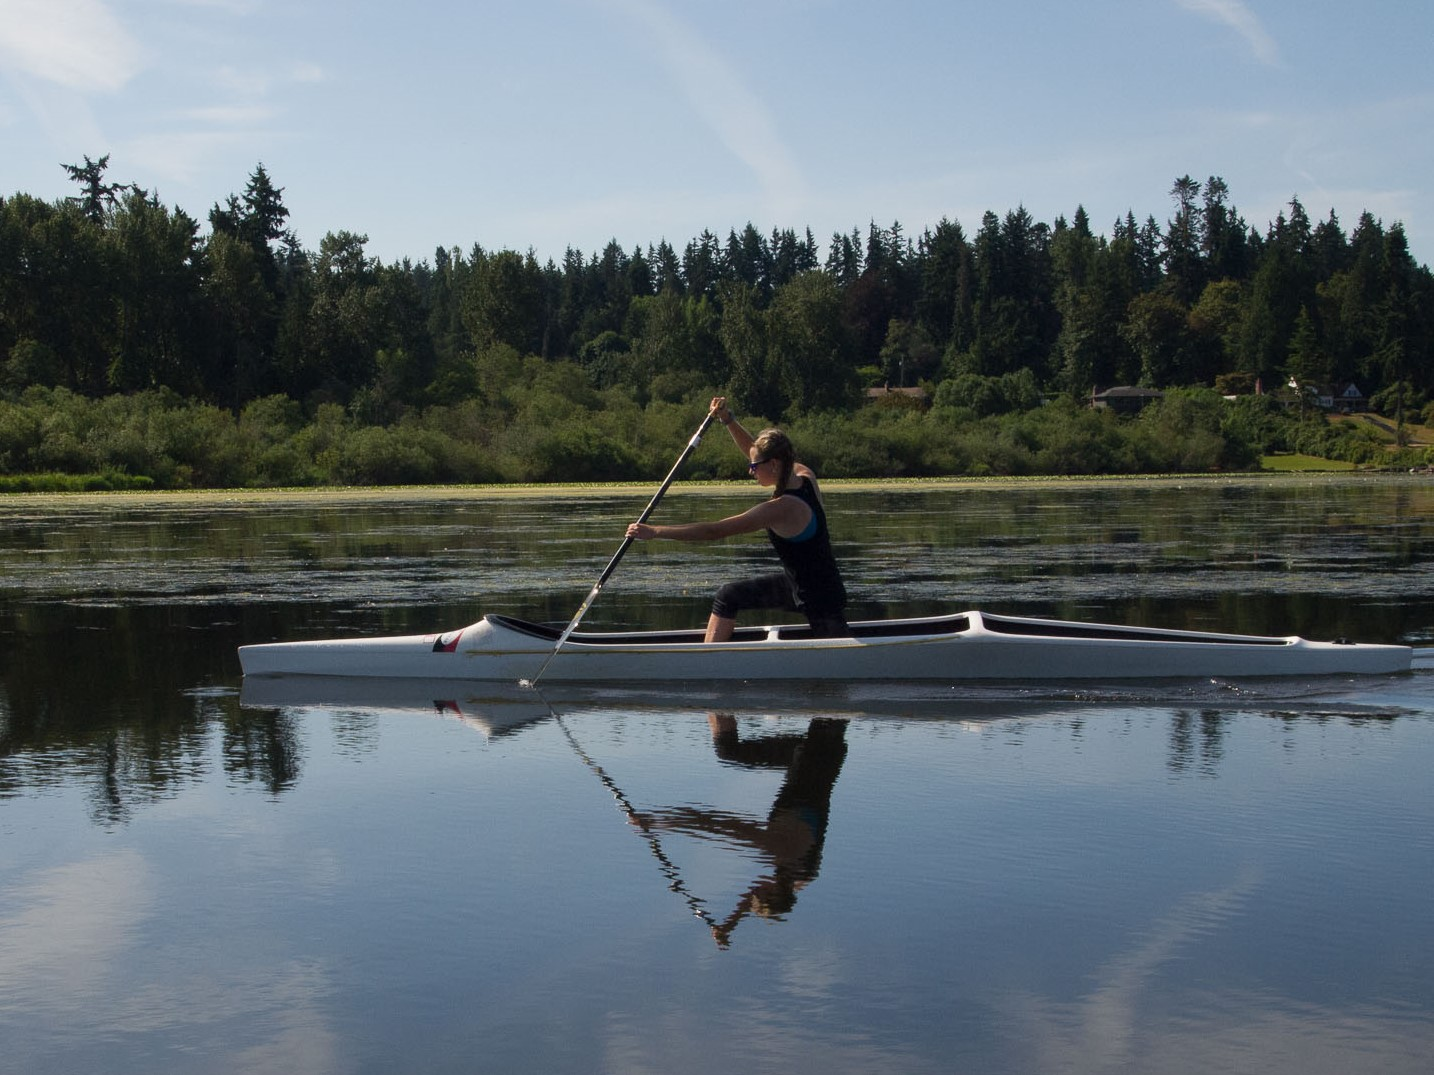 Sprint canoe on Lake Washington